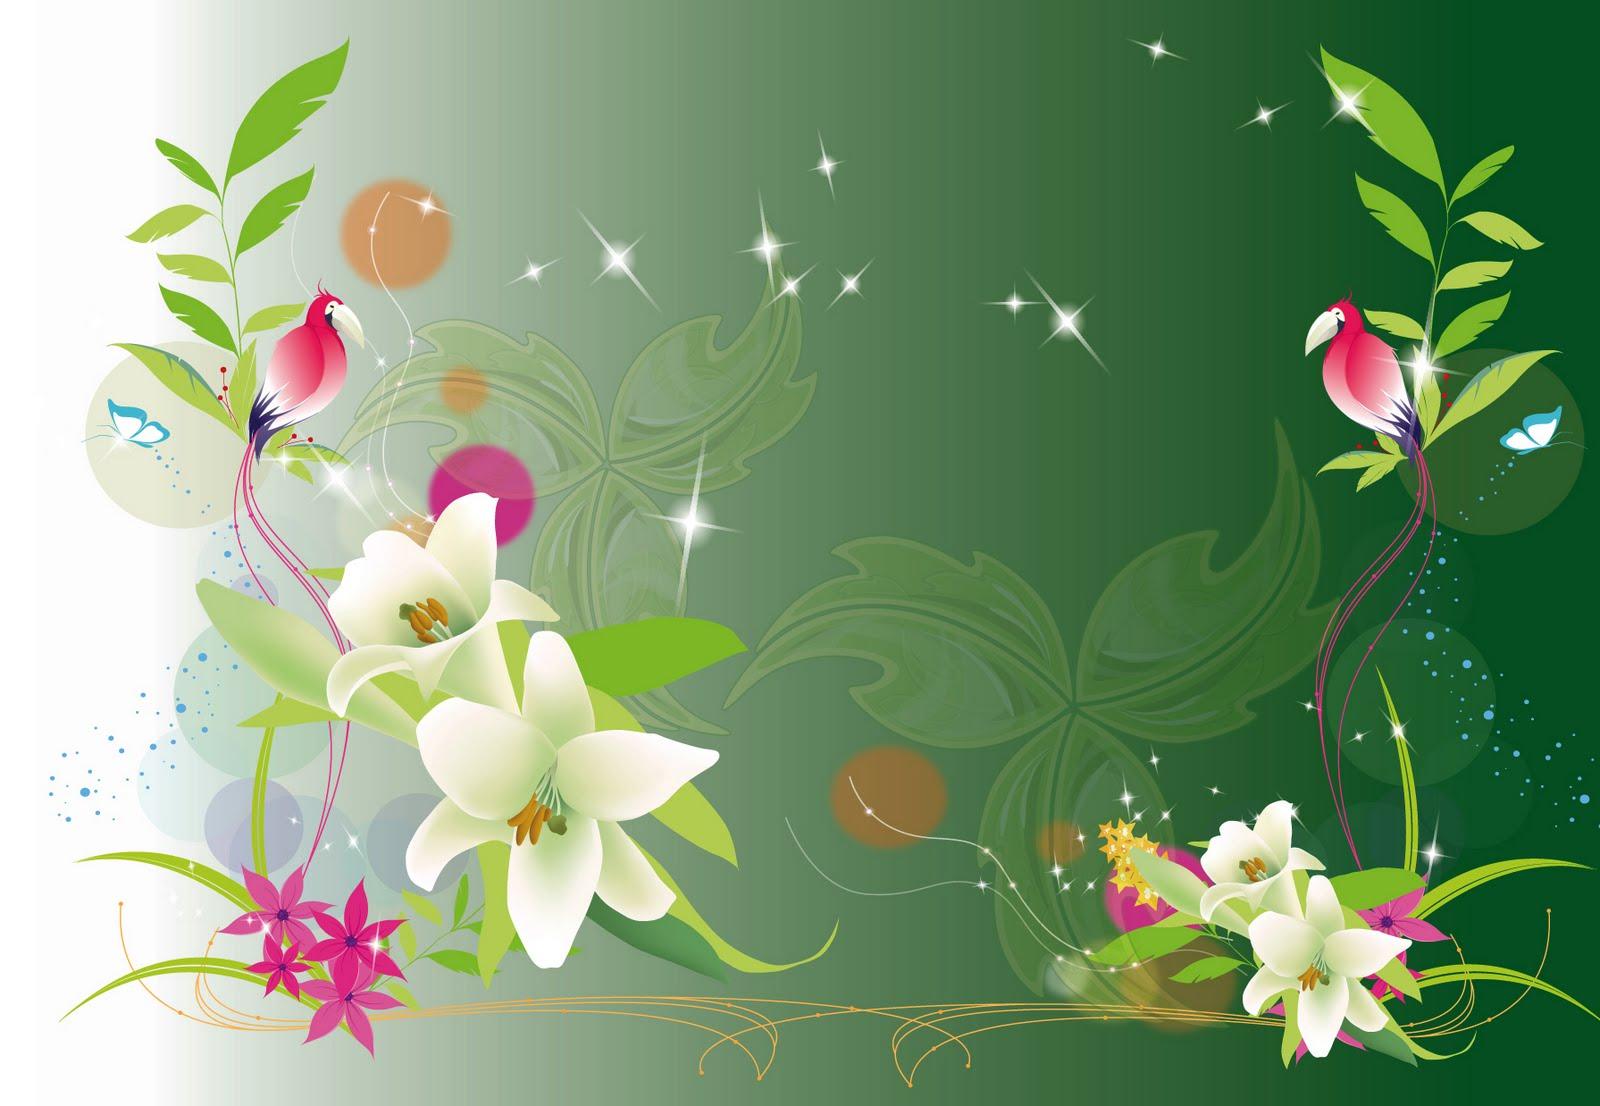 Birthday Cool Flower Designs picture wallpaper (1600 x